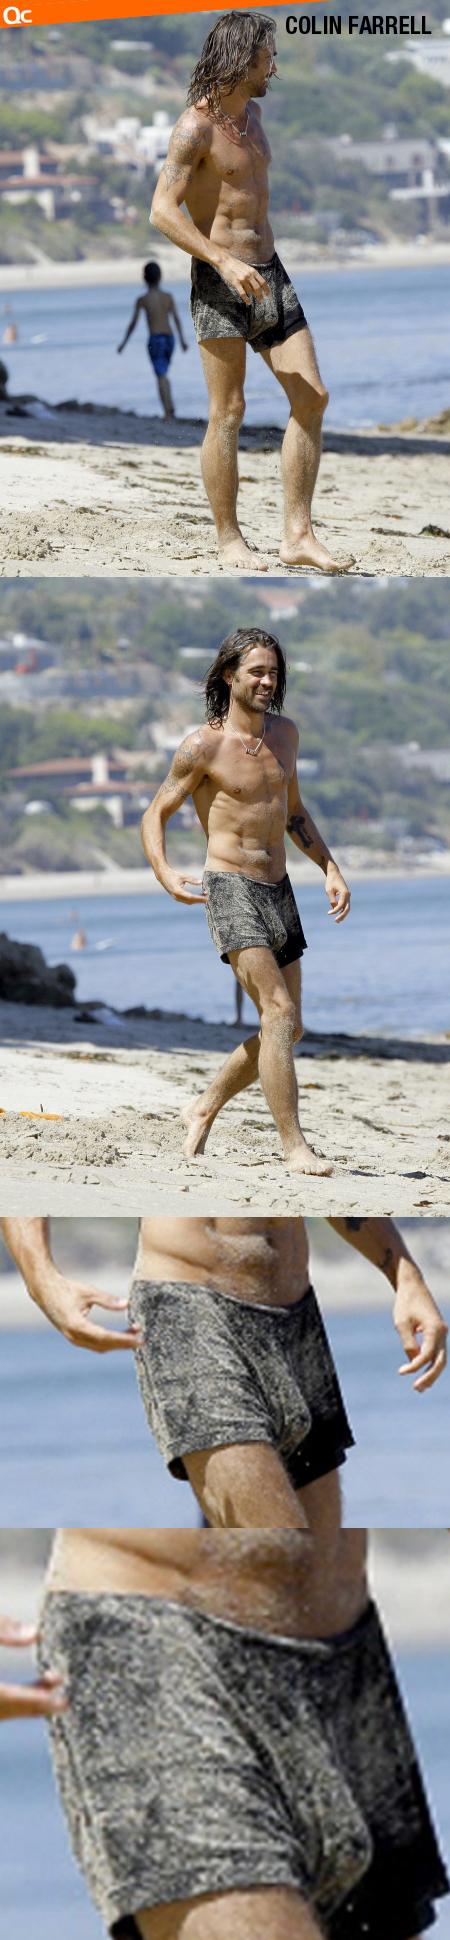 Colin Farrell Beach Bulge